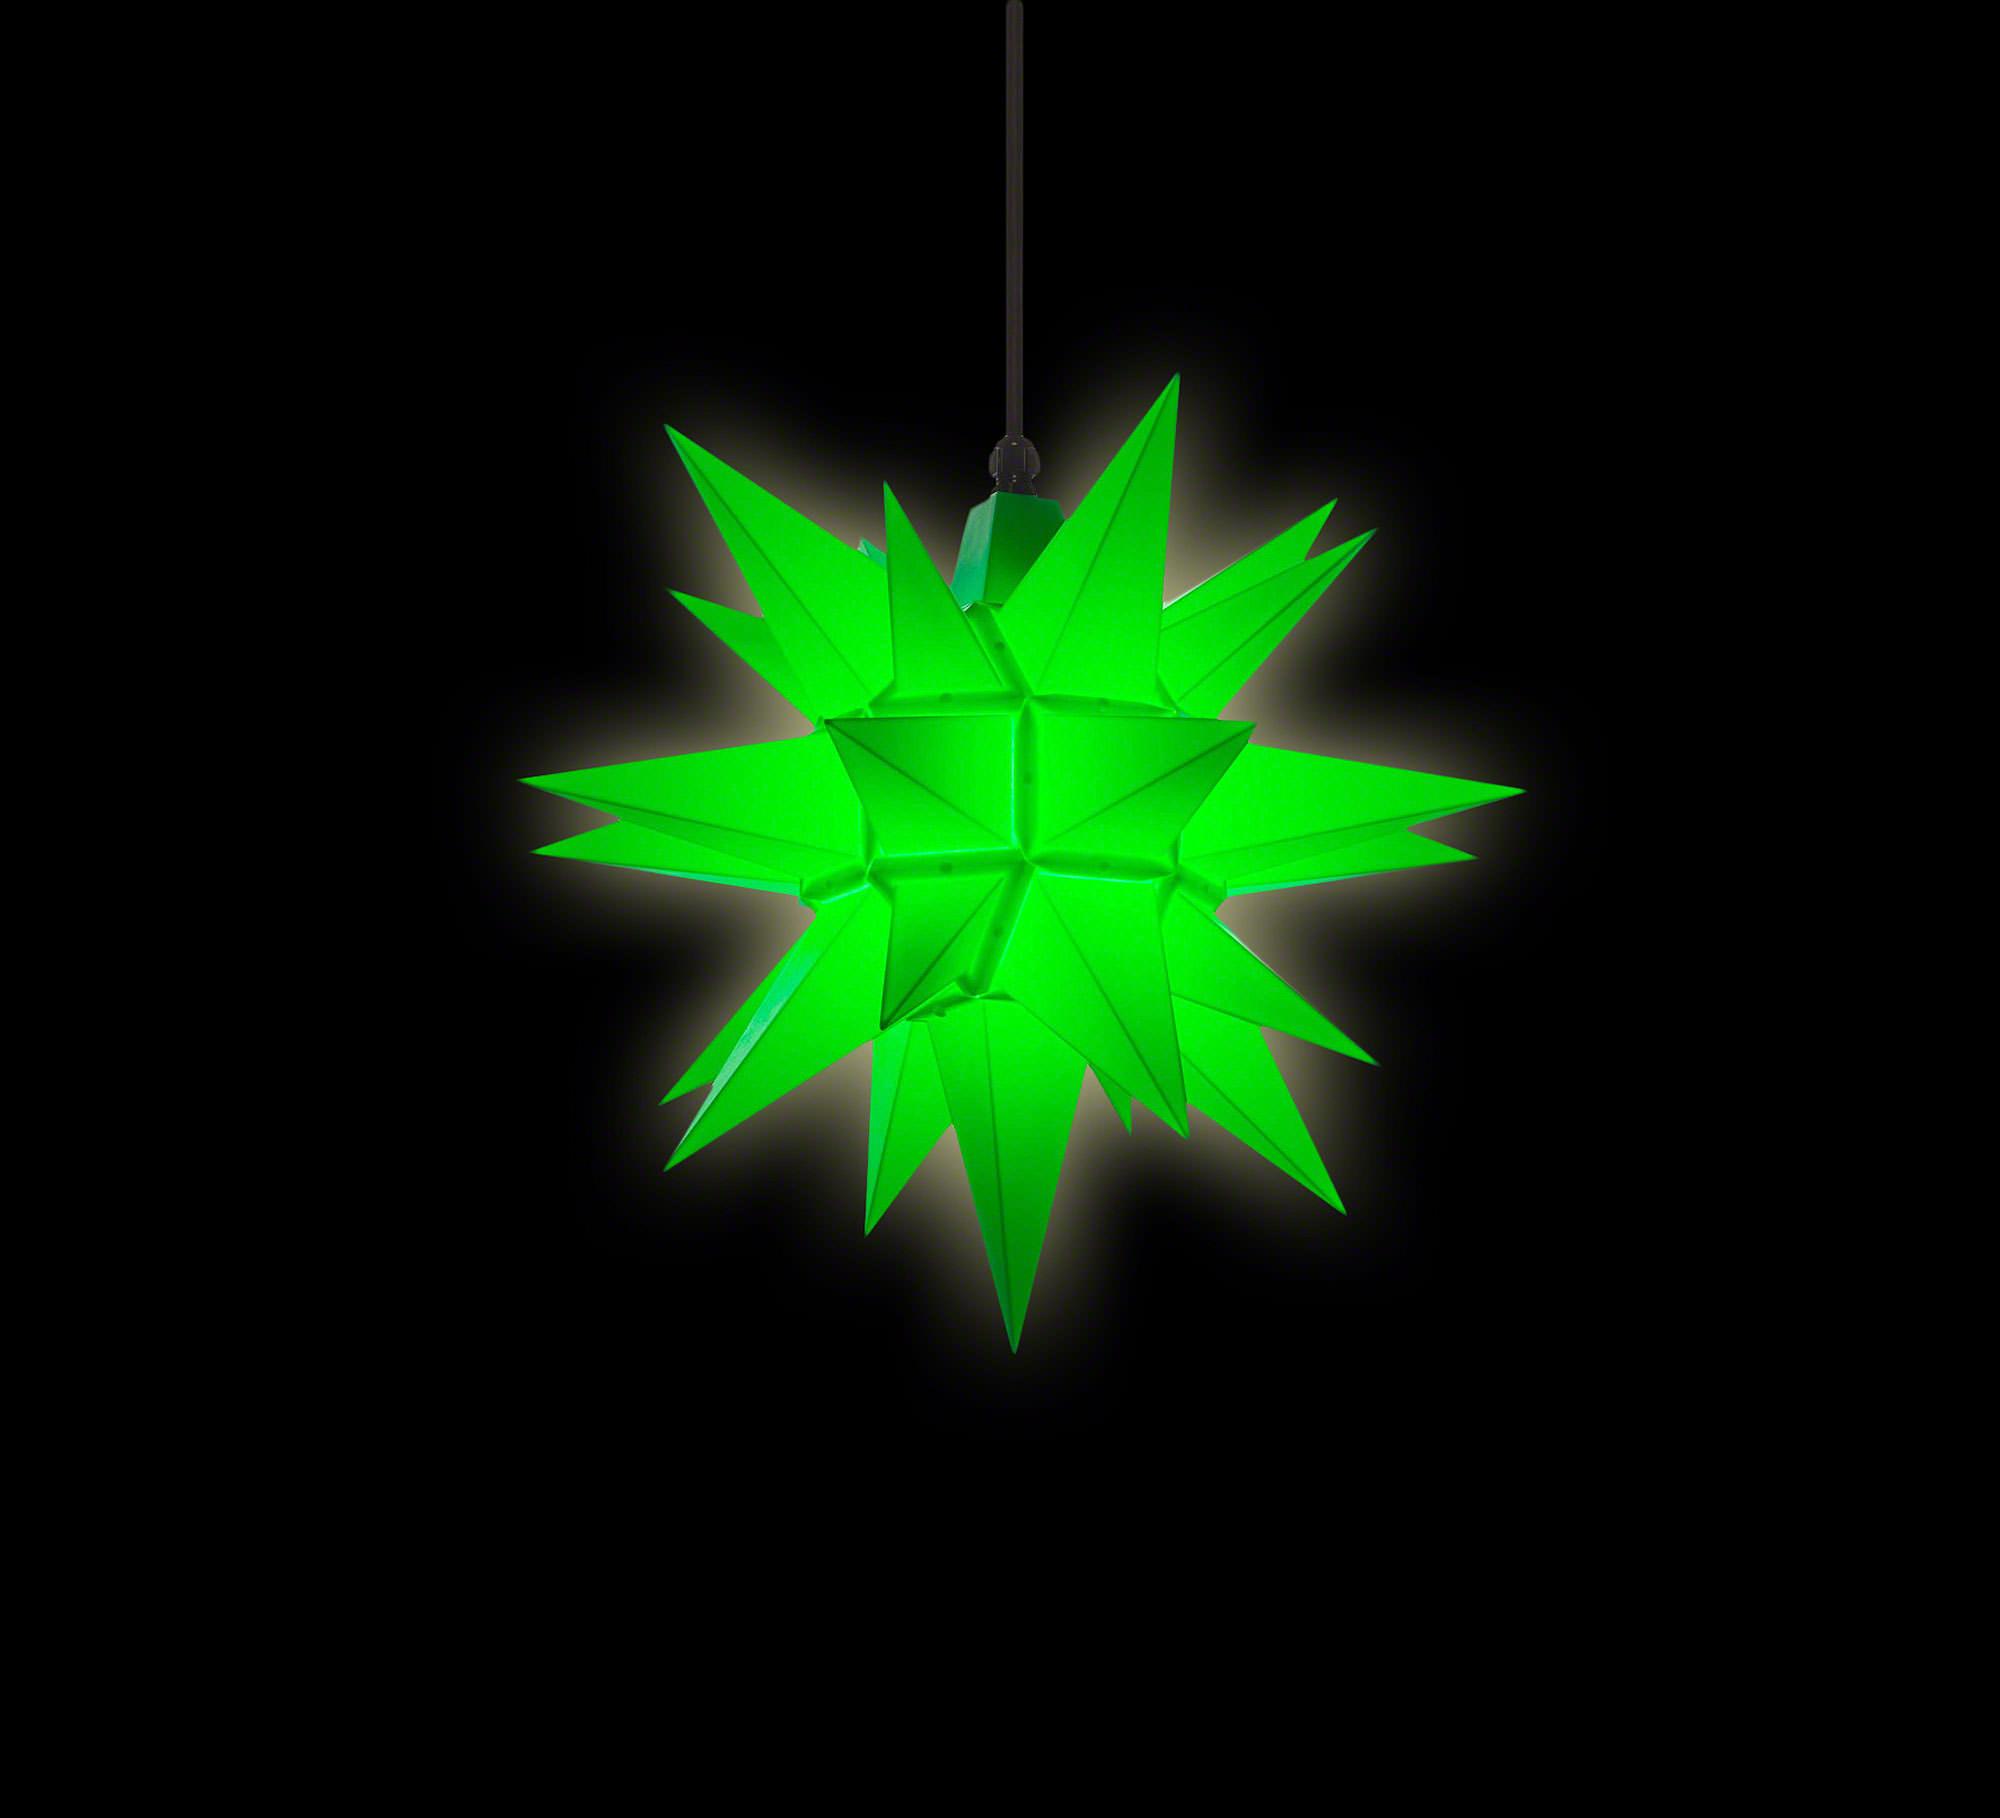 herrnhuter moravian star a4 green plastic 40cm 16in by herrnhuter sterne. Black Bedroom Furniture Sets. Home Design Ideas